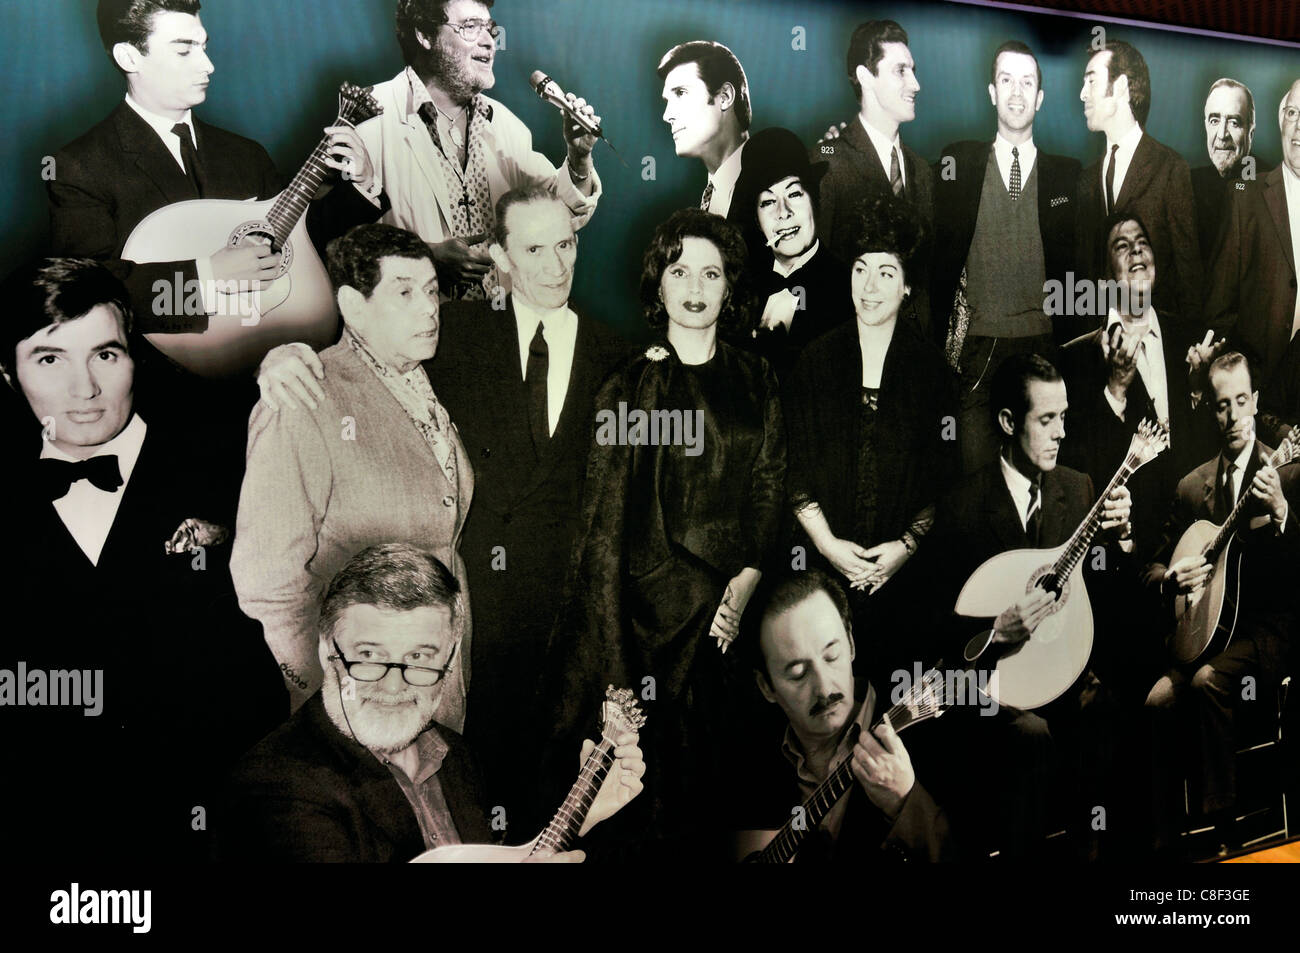 Portugal, Lissabon: Fotografische Wand Collage mit berühmten Fado-Künstlern in der Museu do Fado Stockbild